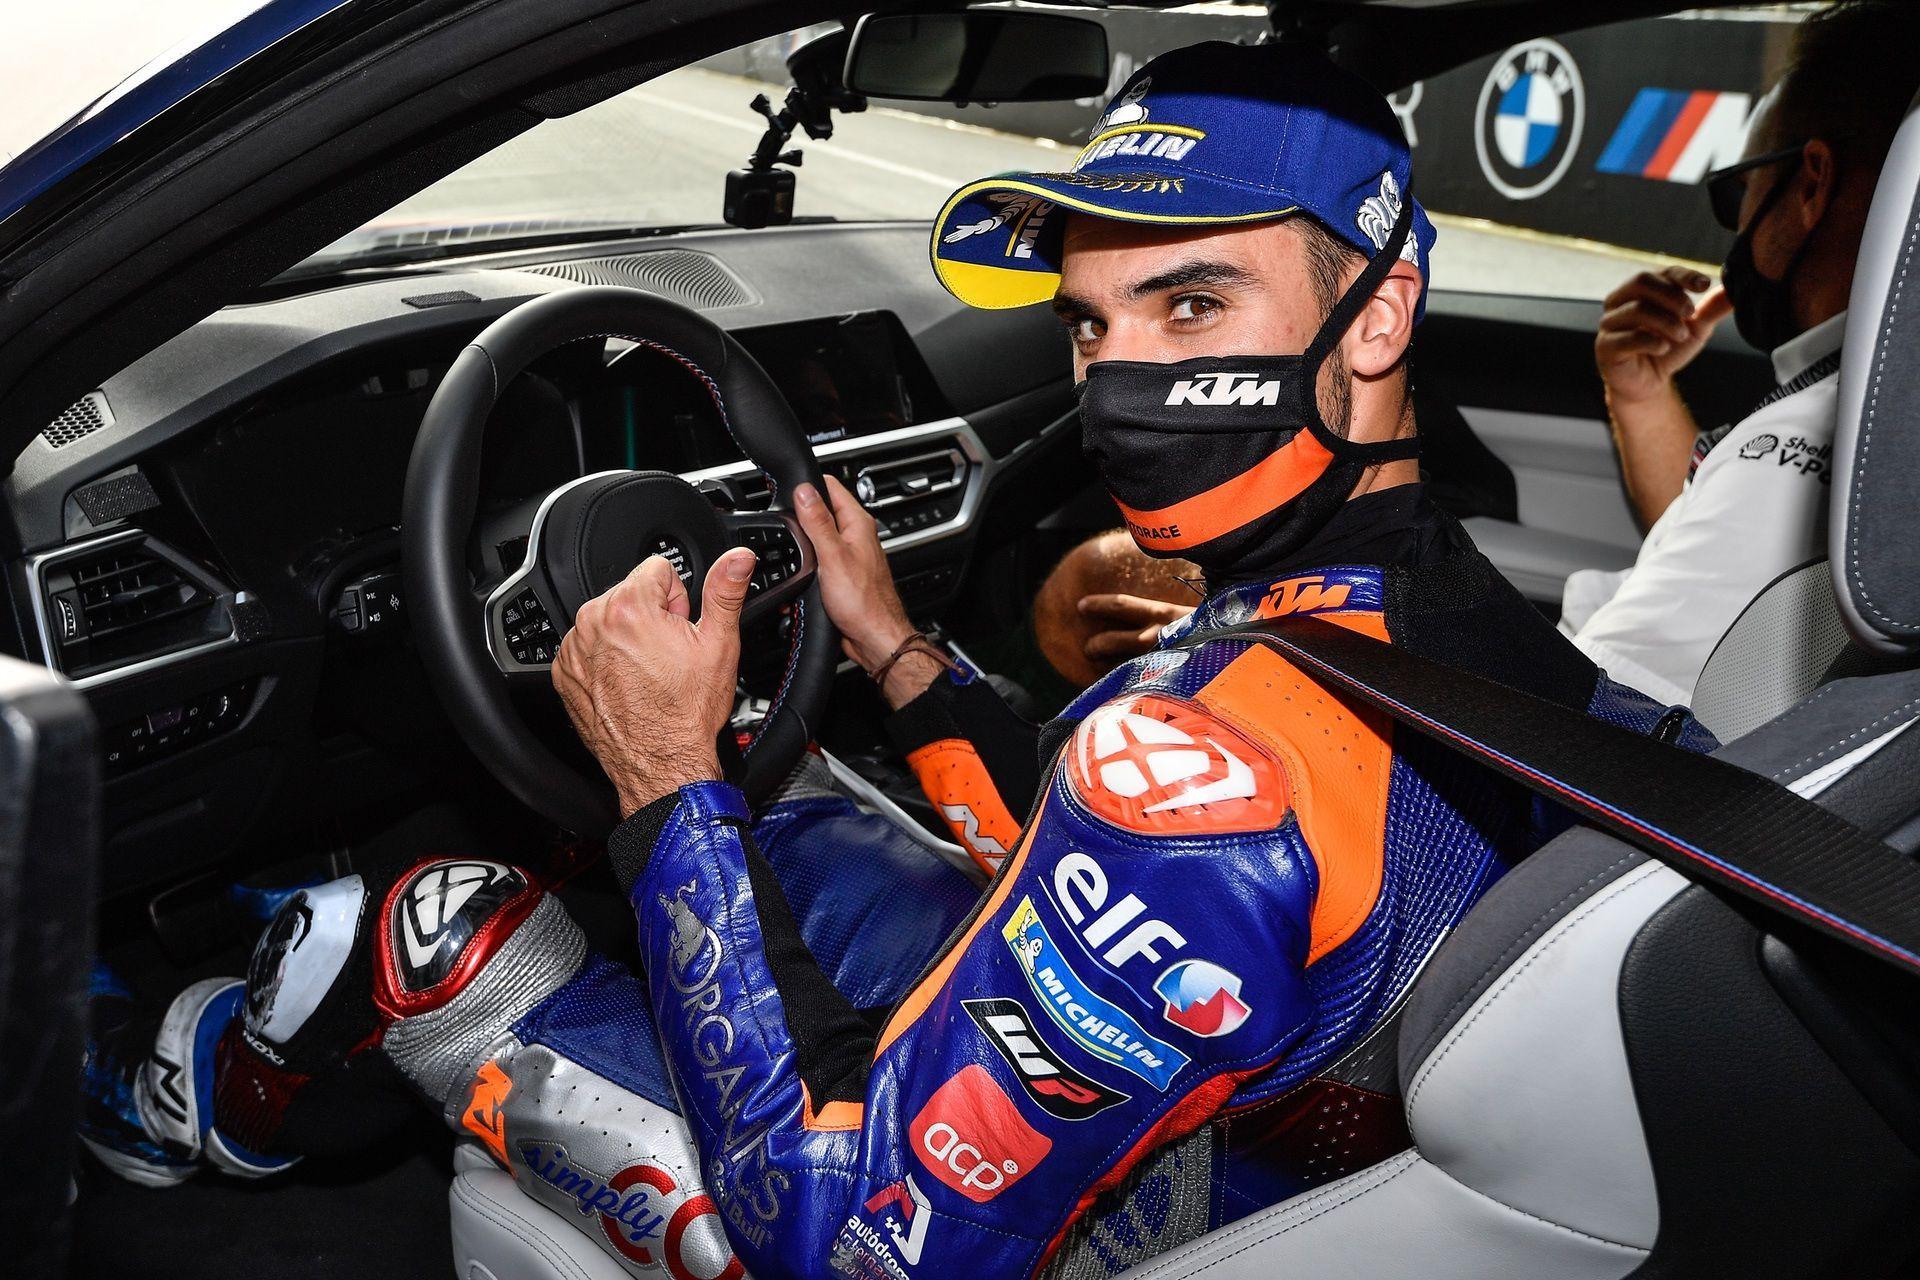 BMW_M8_Gran_Coupe_Safety_Car_MotoGP_0025